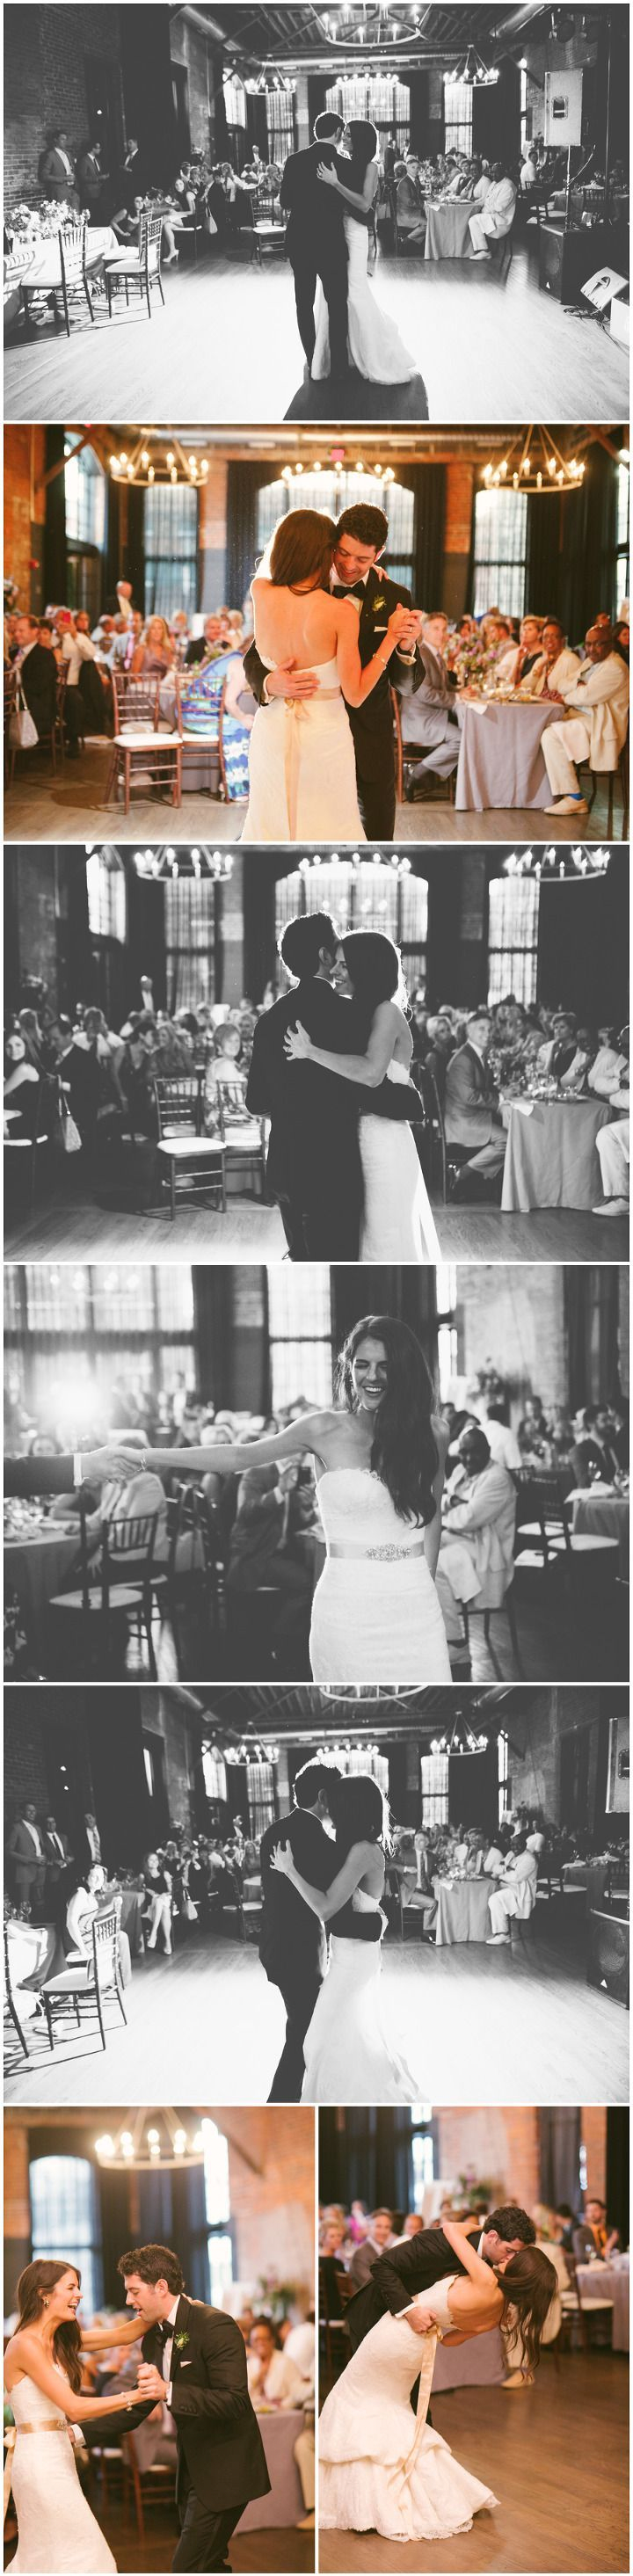 Best 25 Columbus ohio wedding ideas on Pinterest Houses in